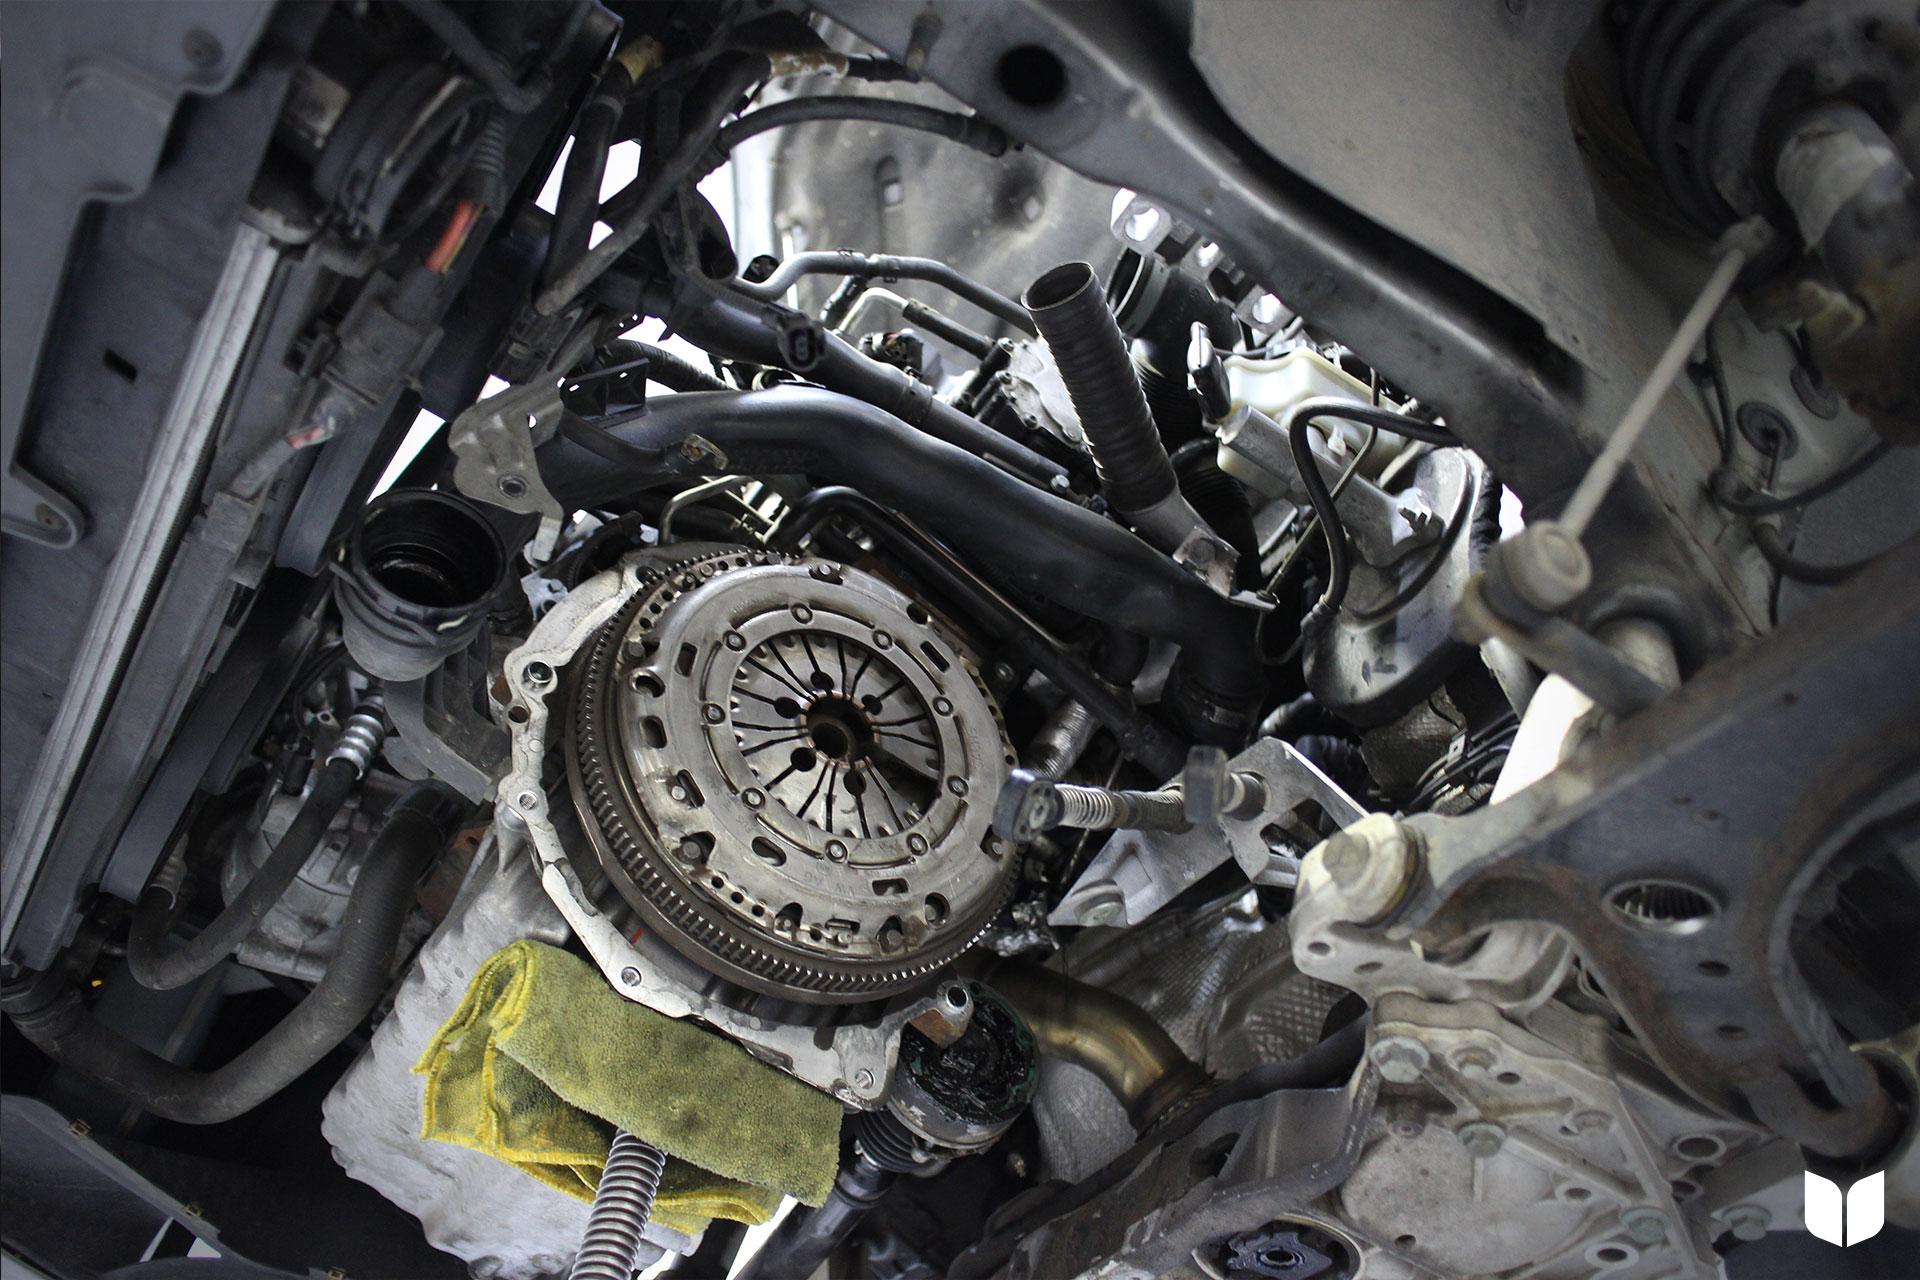 Volkswagen Service Maintenance Repair Parts Score Scottsdale Phoenix Arizona AZ